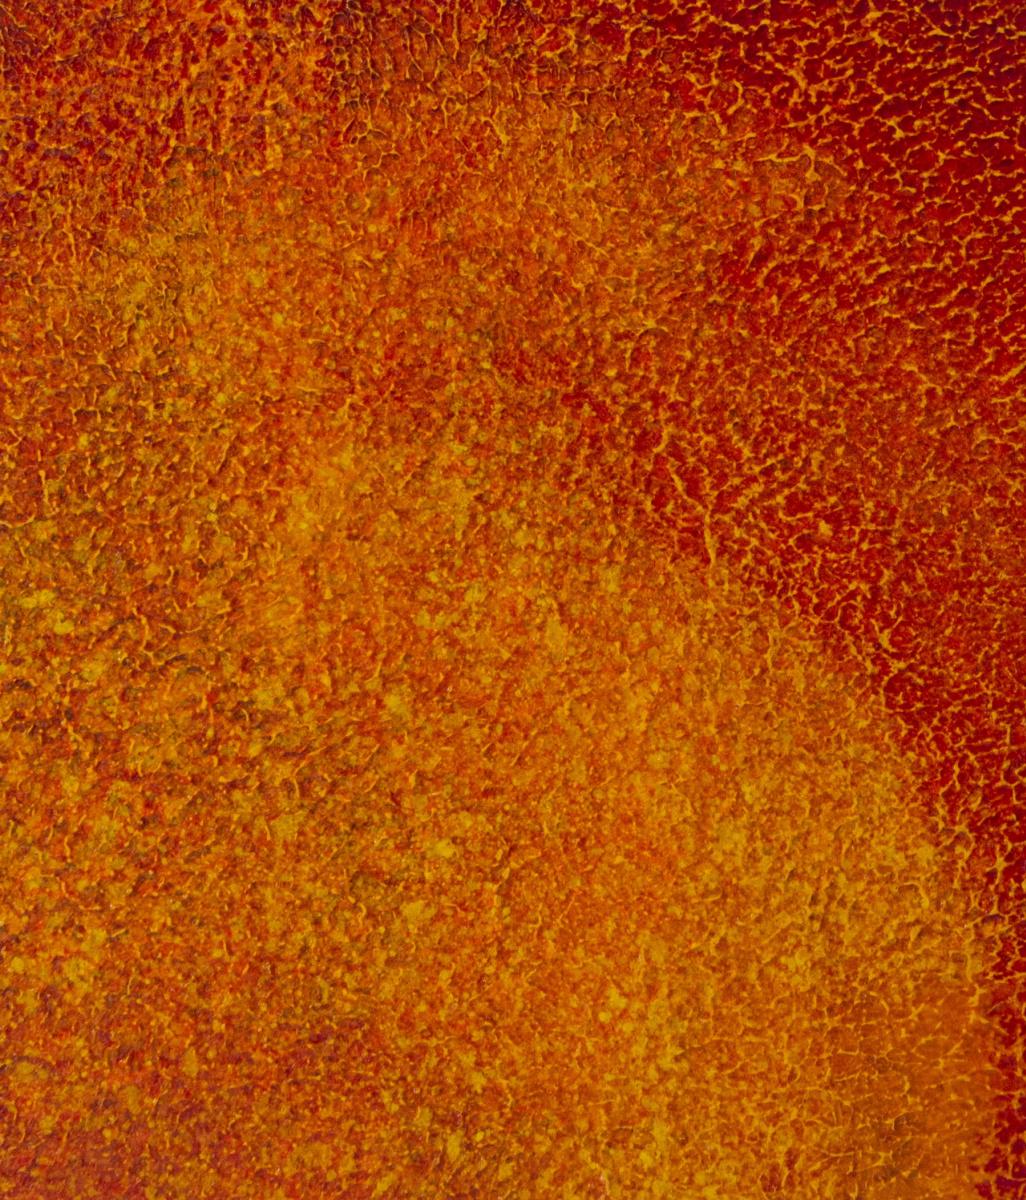 Ольга Акаси. Red Yellow Salience Landscape